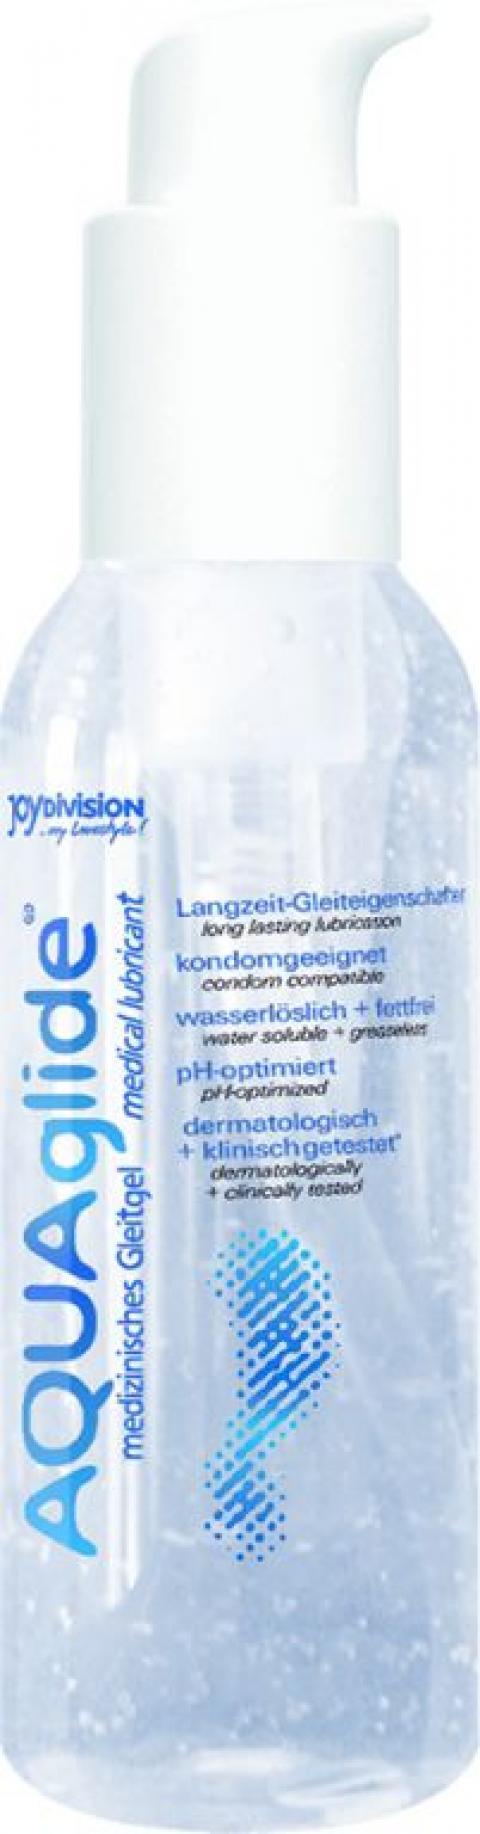 Lubrifiant Aqua Glide 125 ml